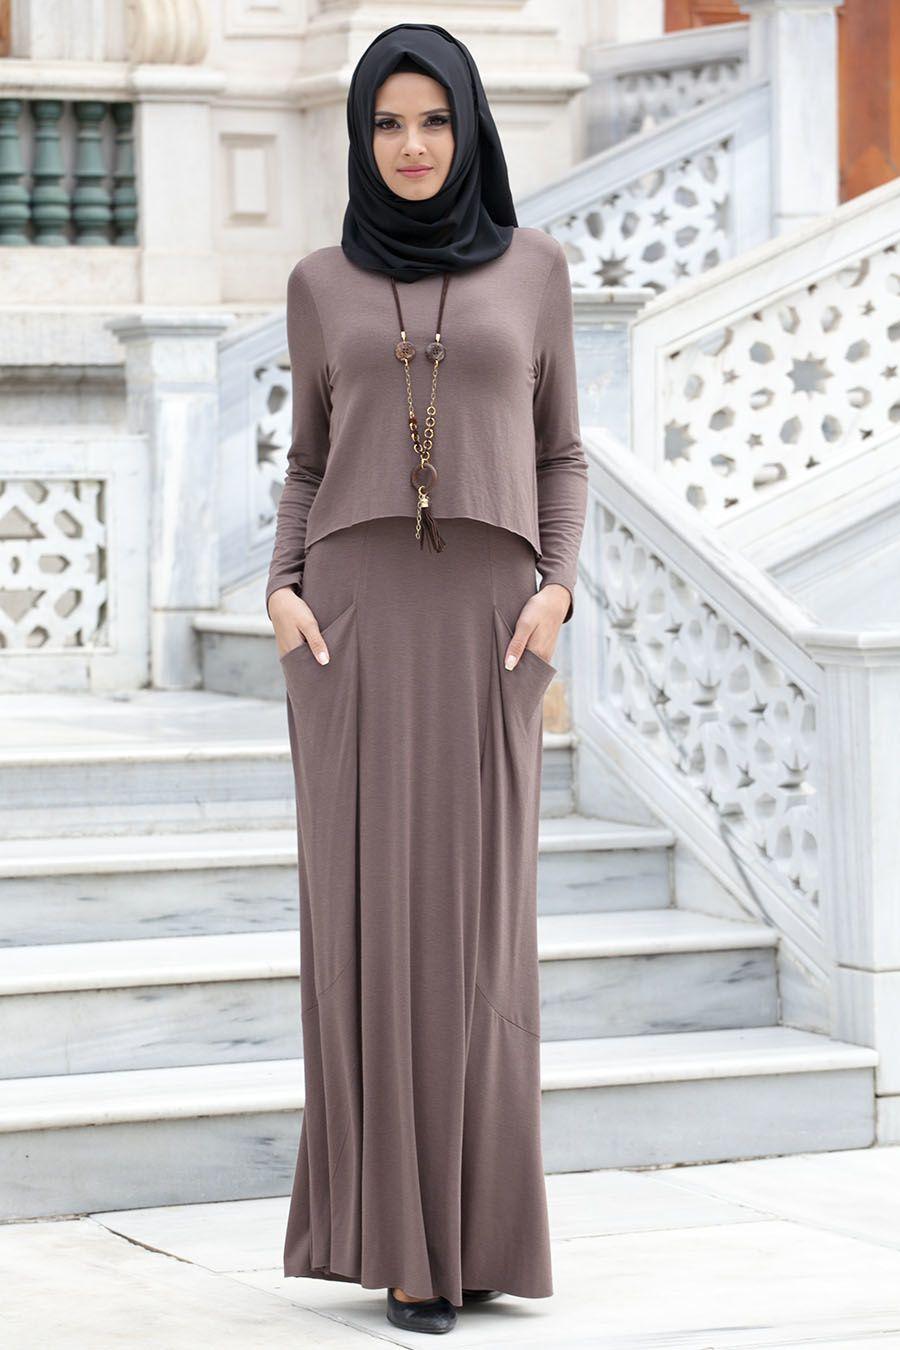 En Ozel Tesettur Penye Elbise Modelleri Moda Stilleri Elbise Elbise Modelleri